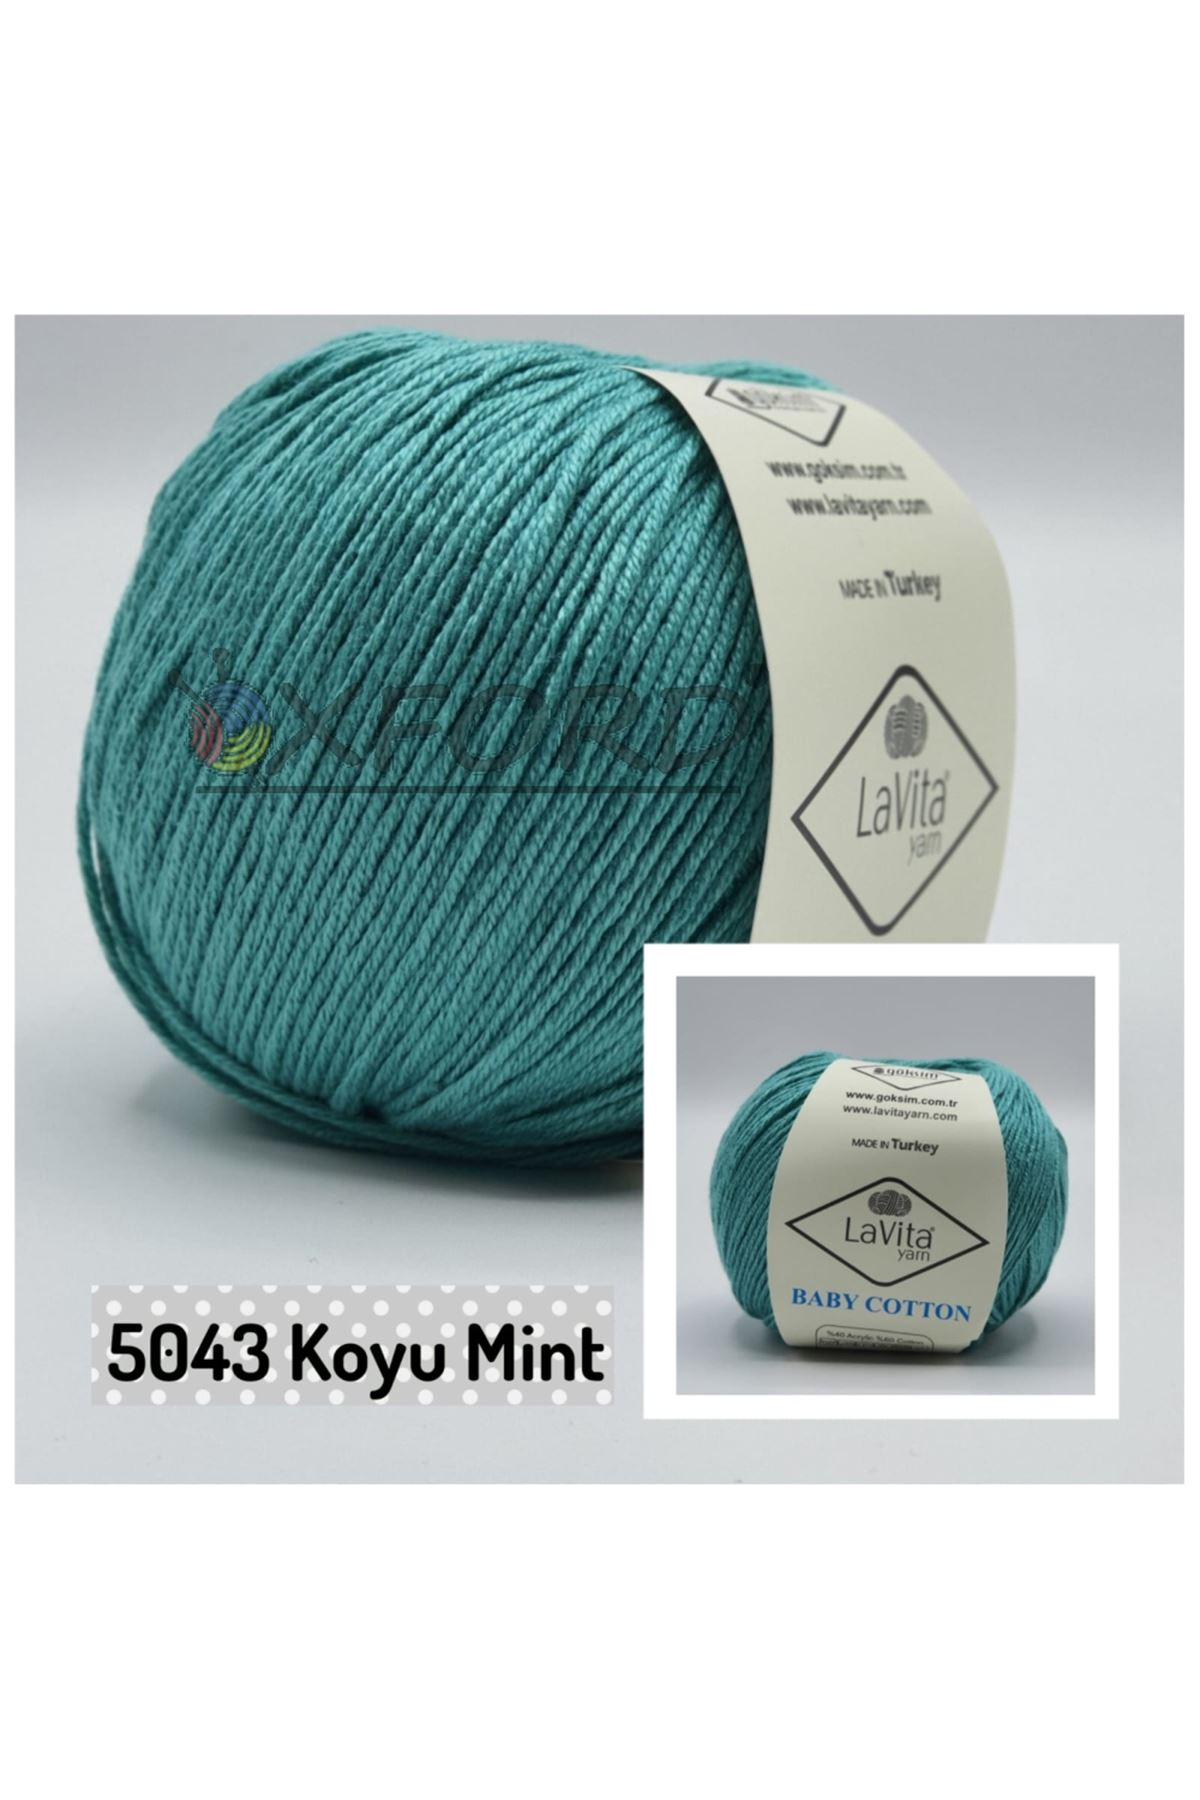 Lavita Baby Cotton 5043 Koyu Mint